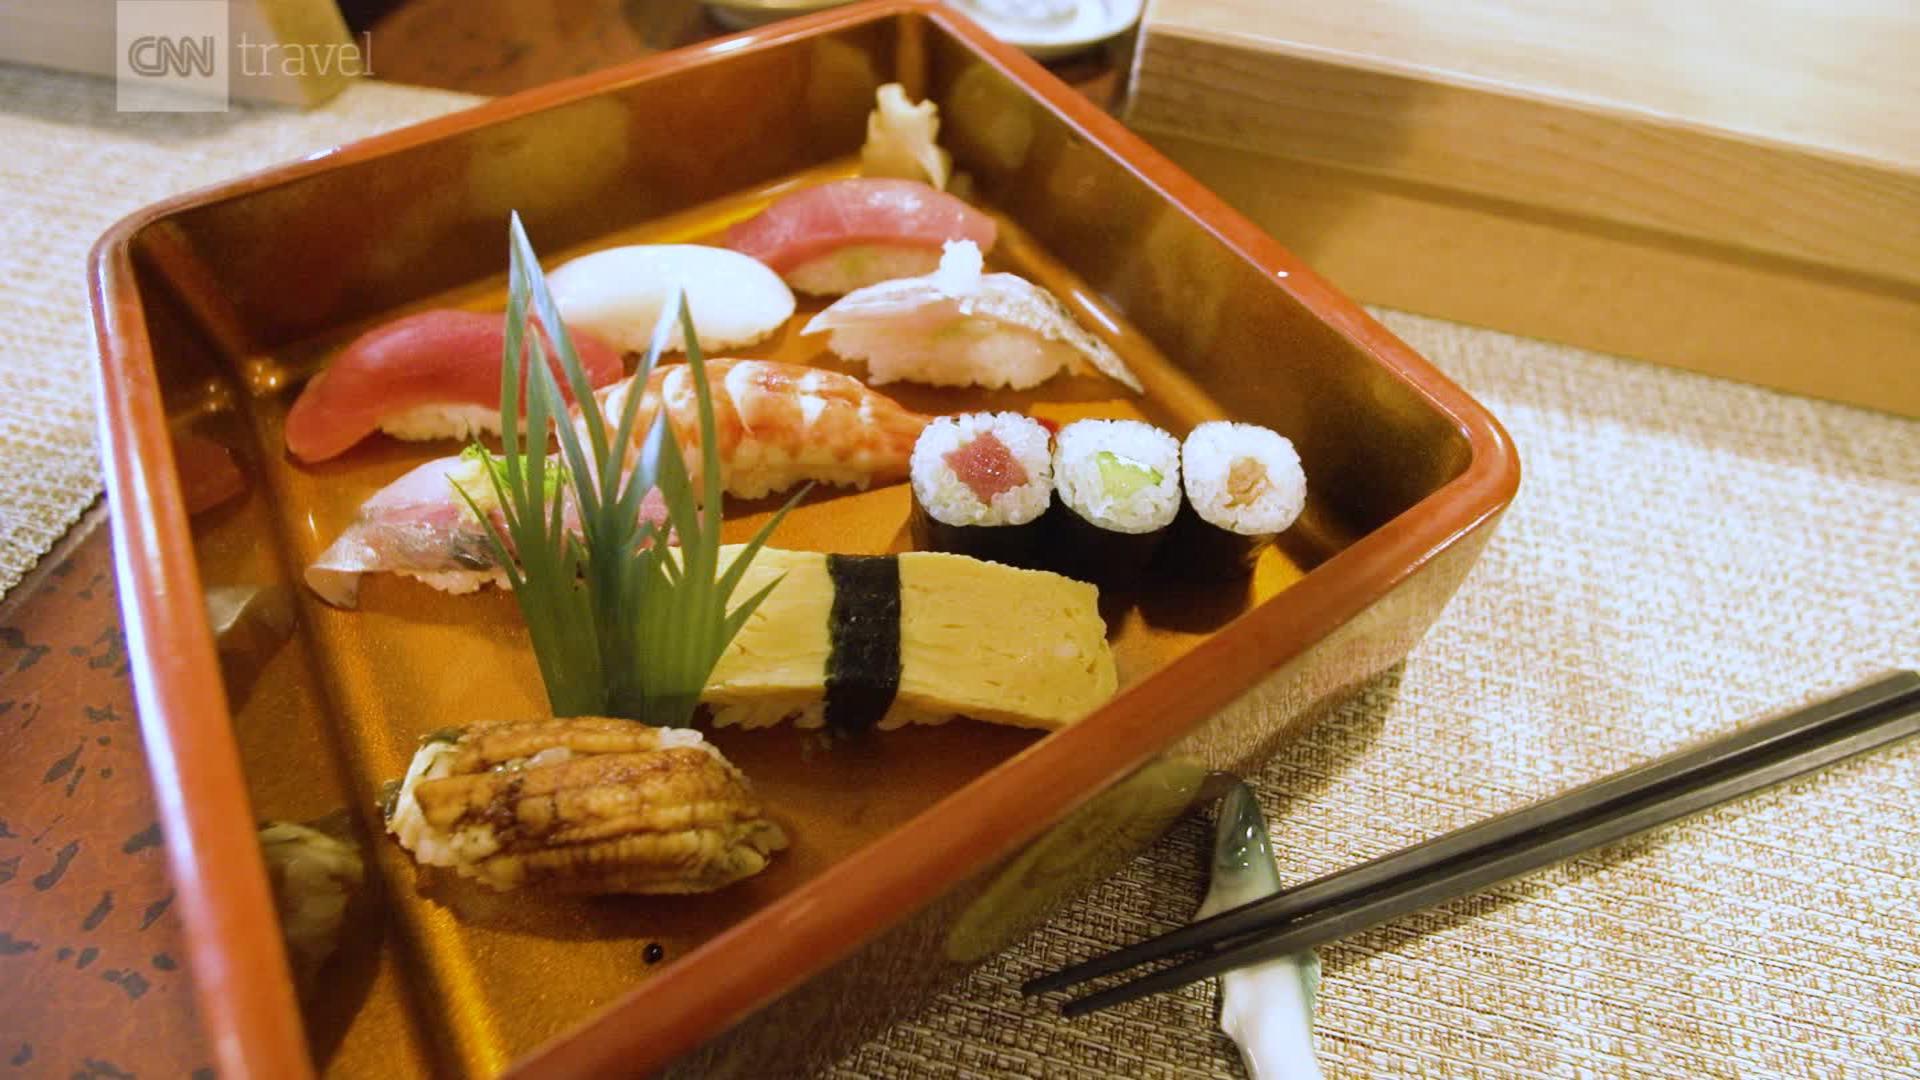 World food: 50 best dishes | CNN Travel